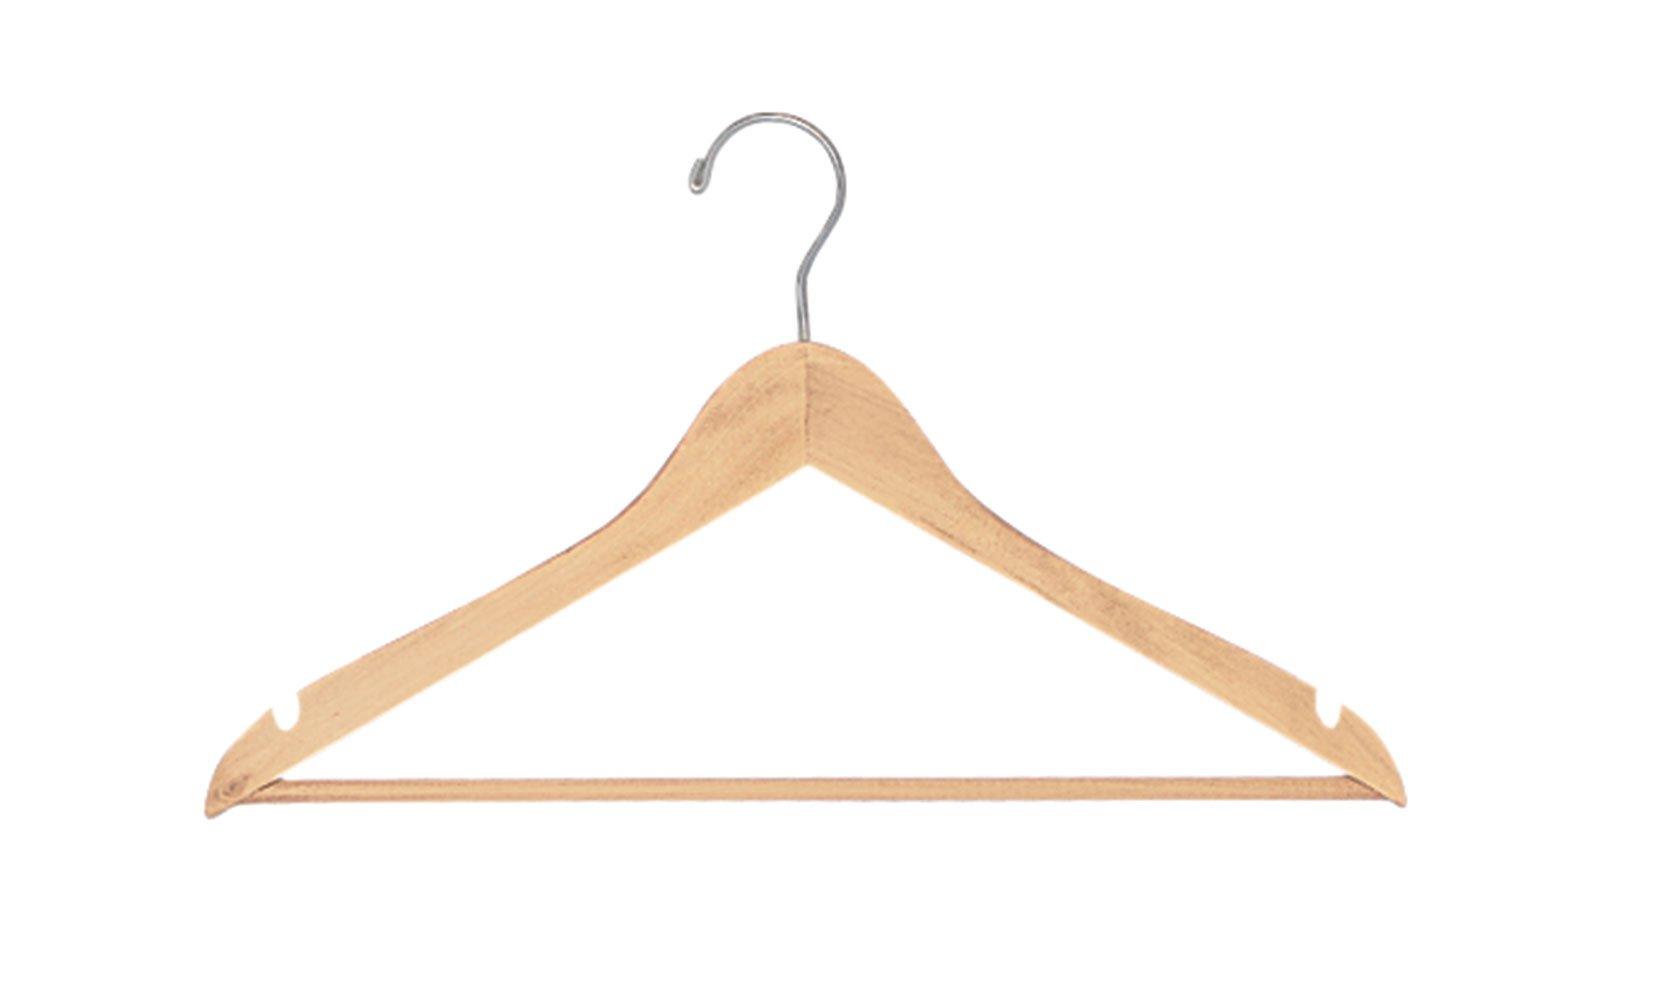 SSWBasics Natural Wood Hangers (All Purpose 17'') - Case of 50